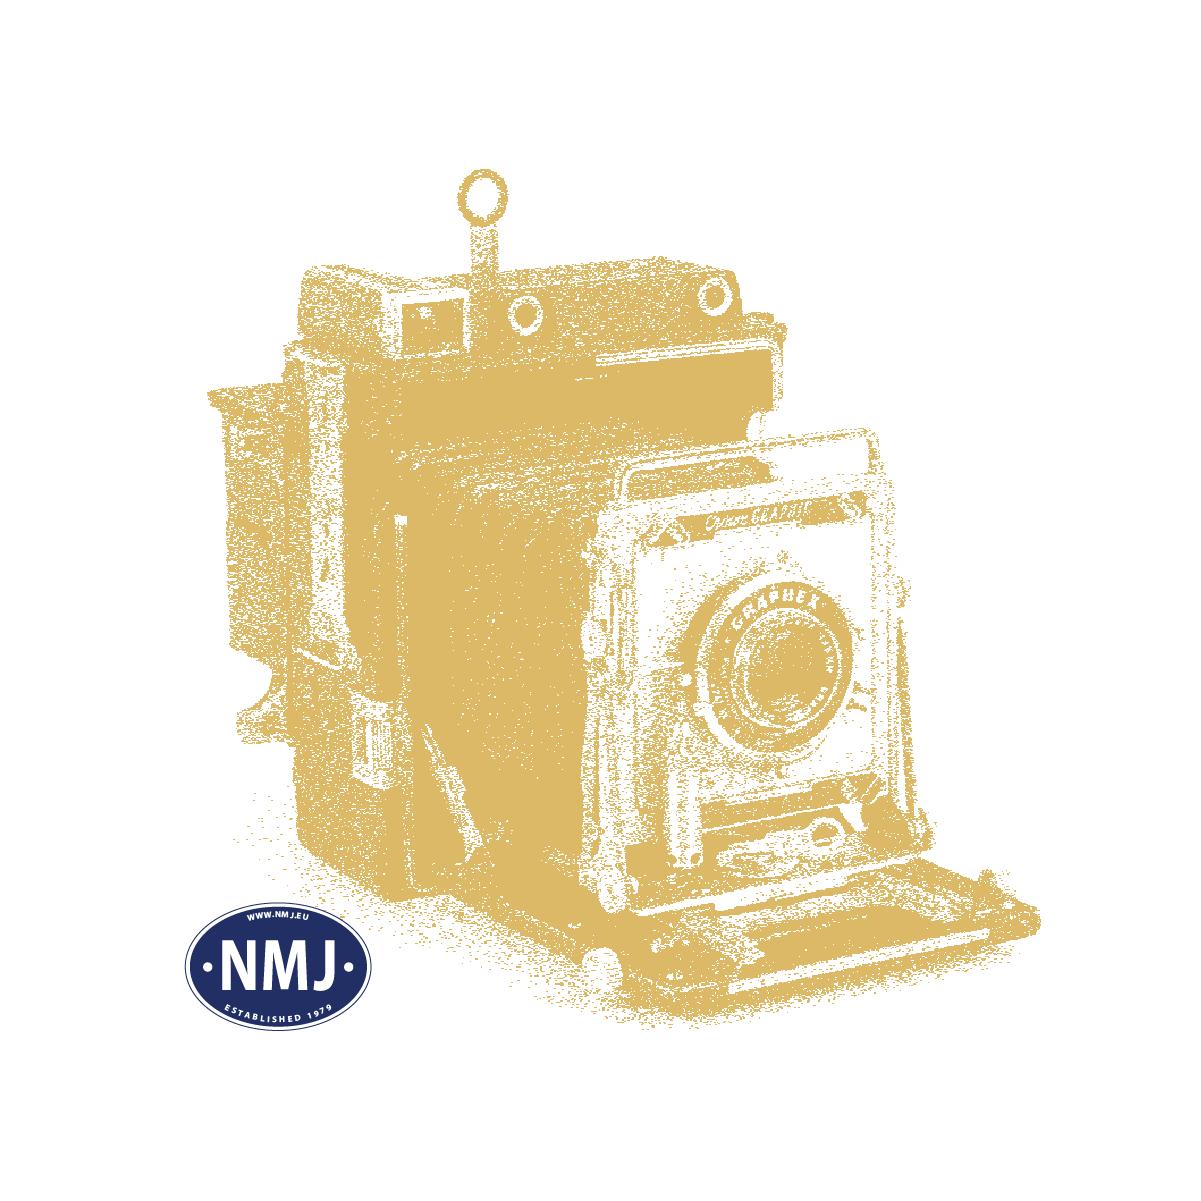 NMJT83.411 - NMJ Topline JBV SKD224.220, DCC Digital